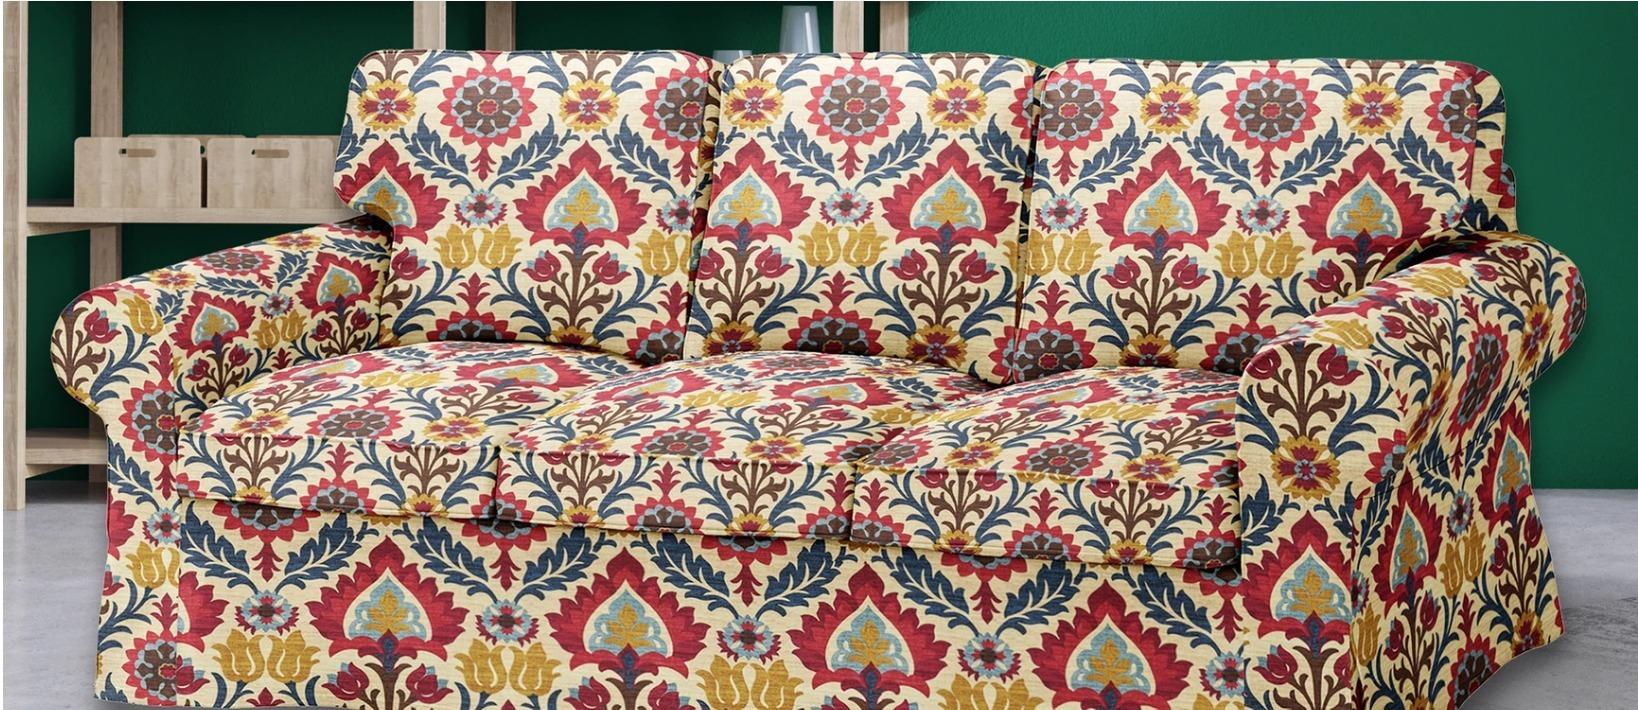 Rockin Cushions (@rockincushions) Cover Image